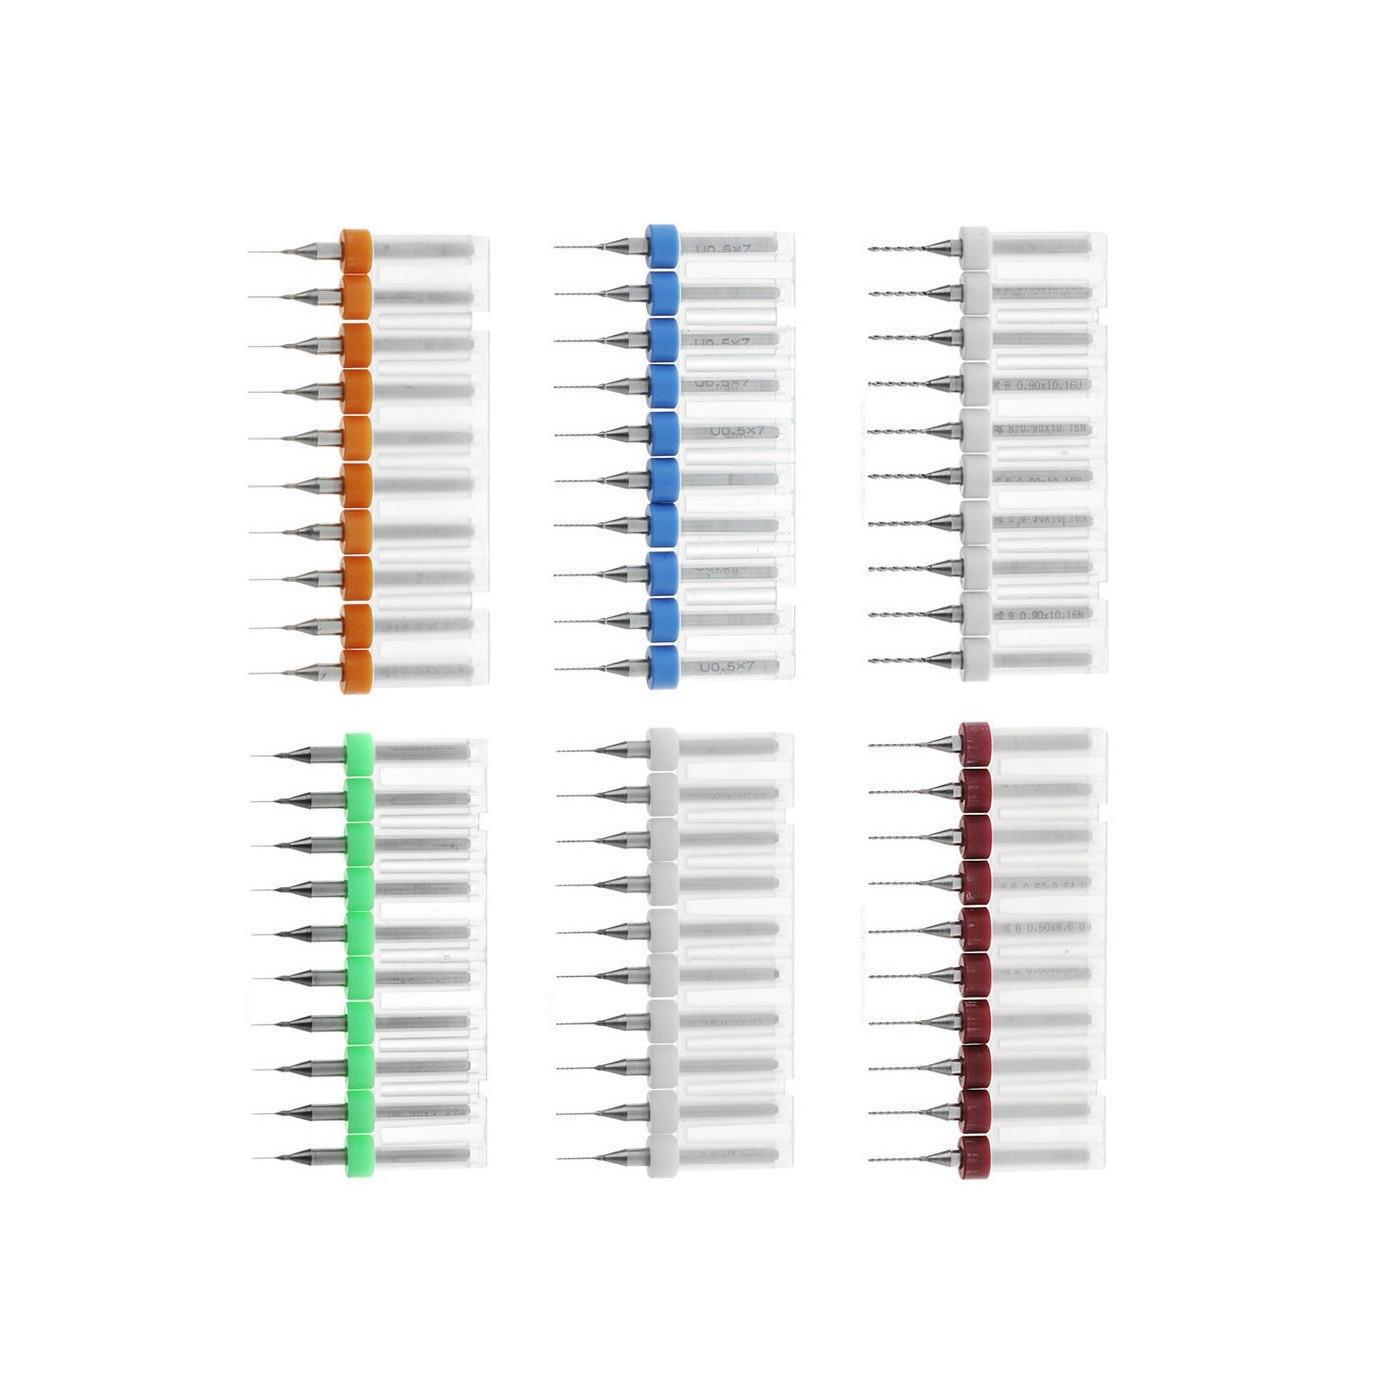 Set of 10 micro drill bits in box (1.05 mm)